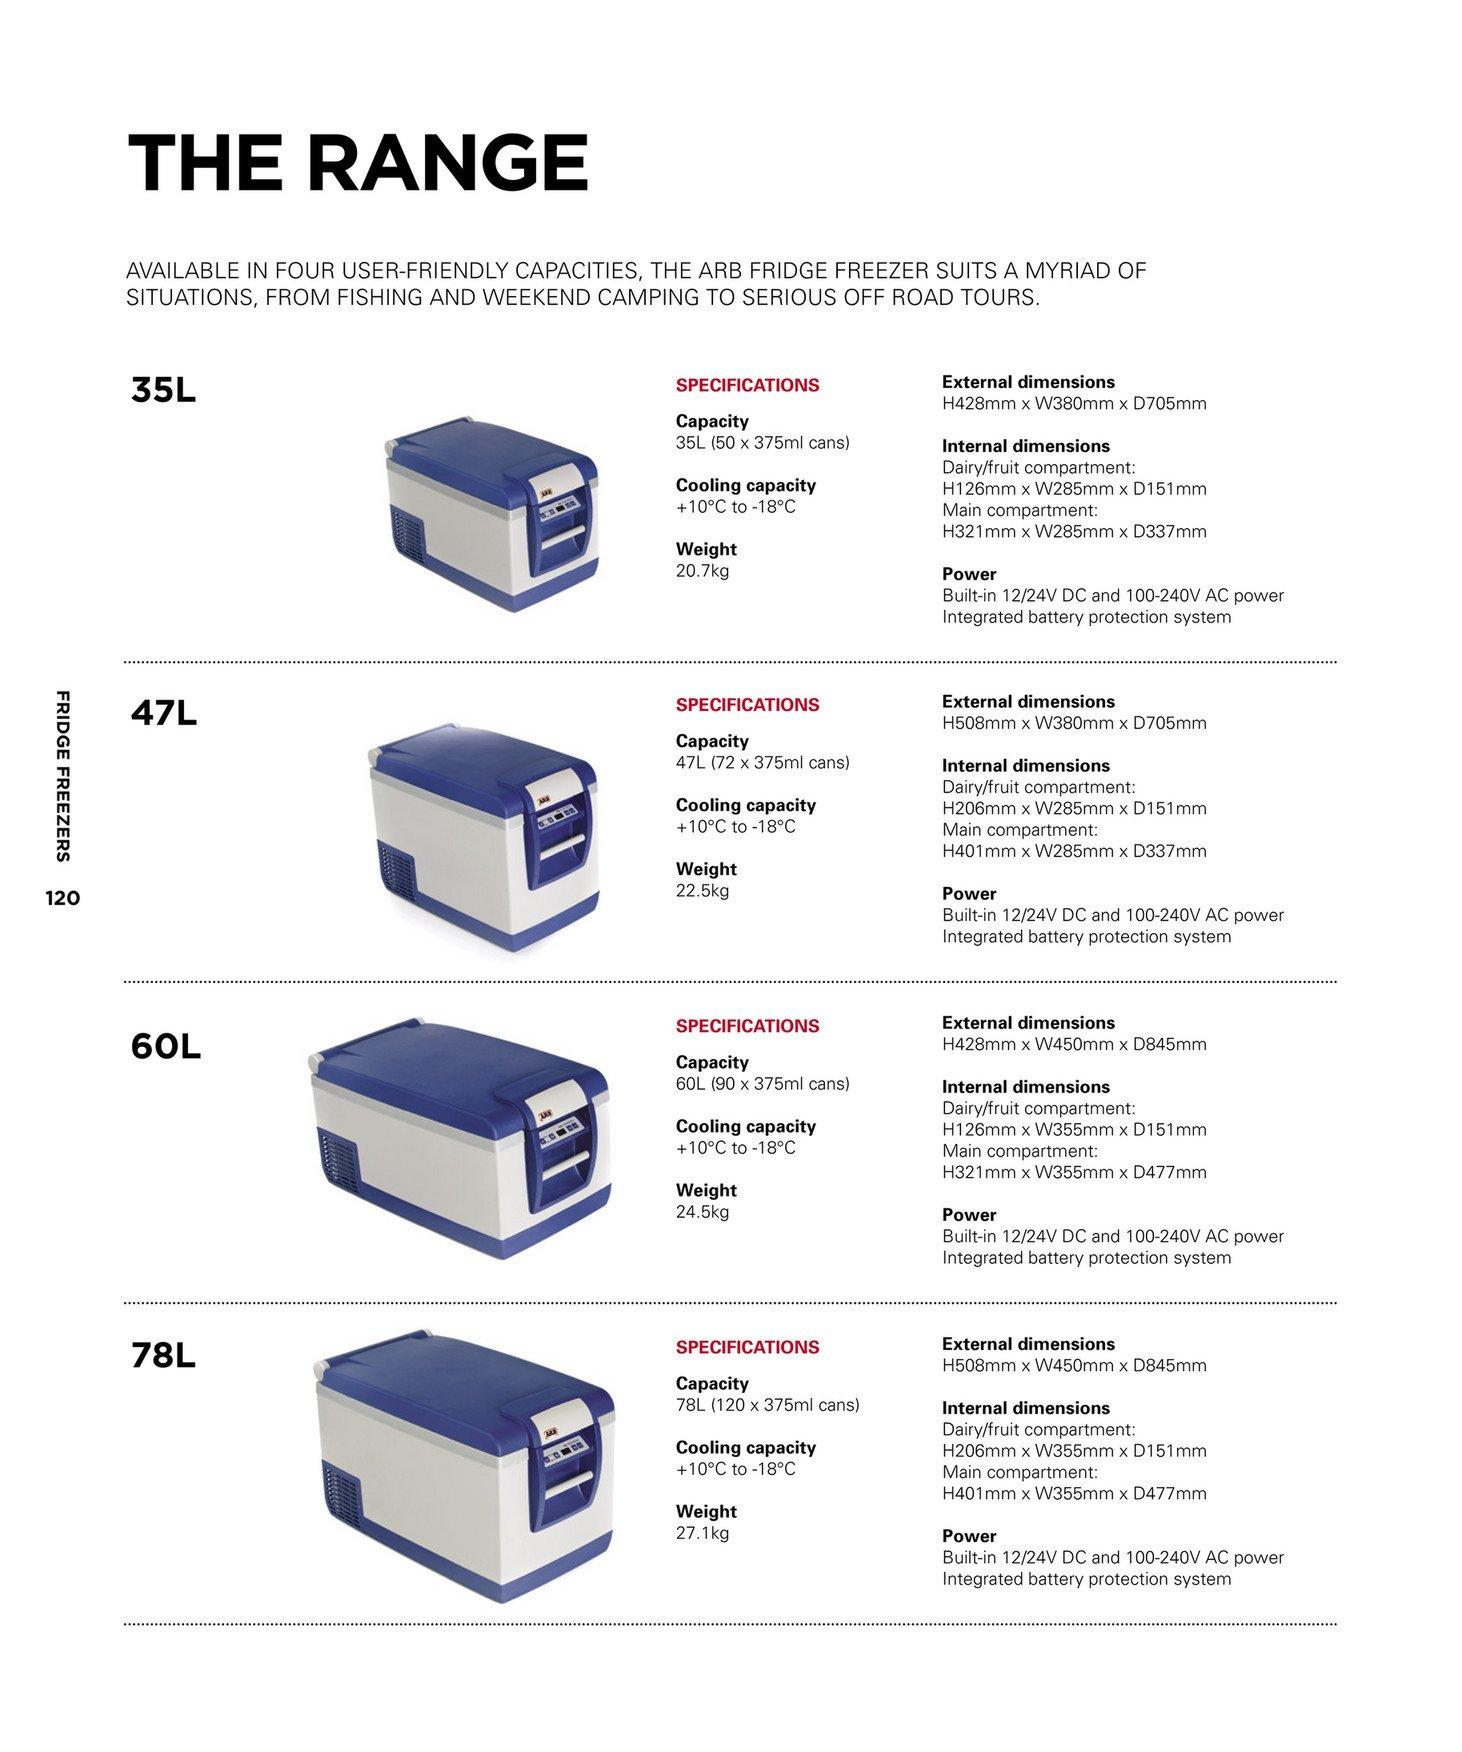 ARB Fridge Freezer 82 Quart Bundle with ARB Wireless Fridge Remote Display 10800782RM by ARB (Image #6)